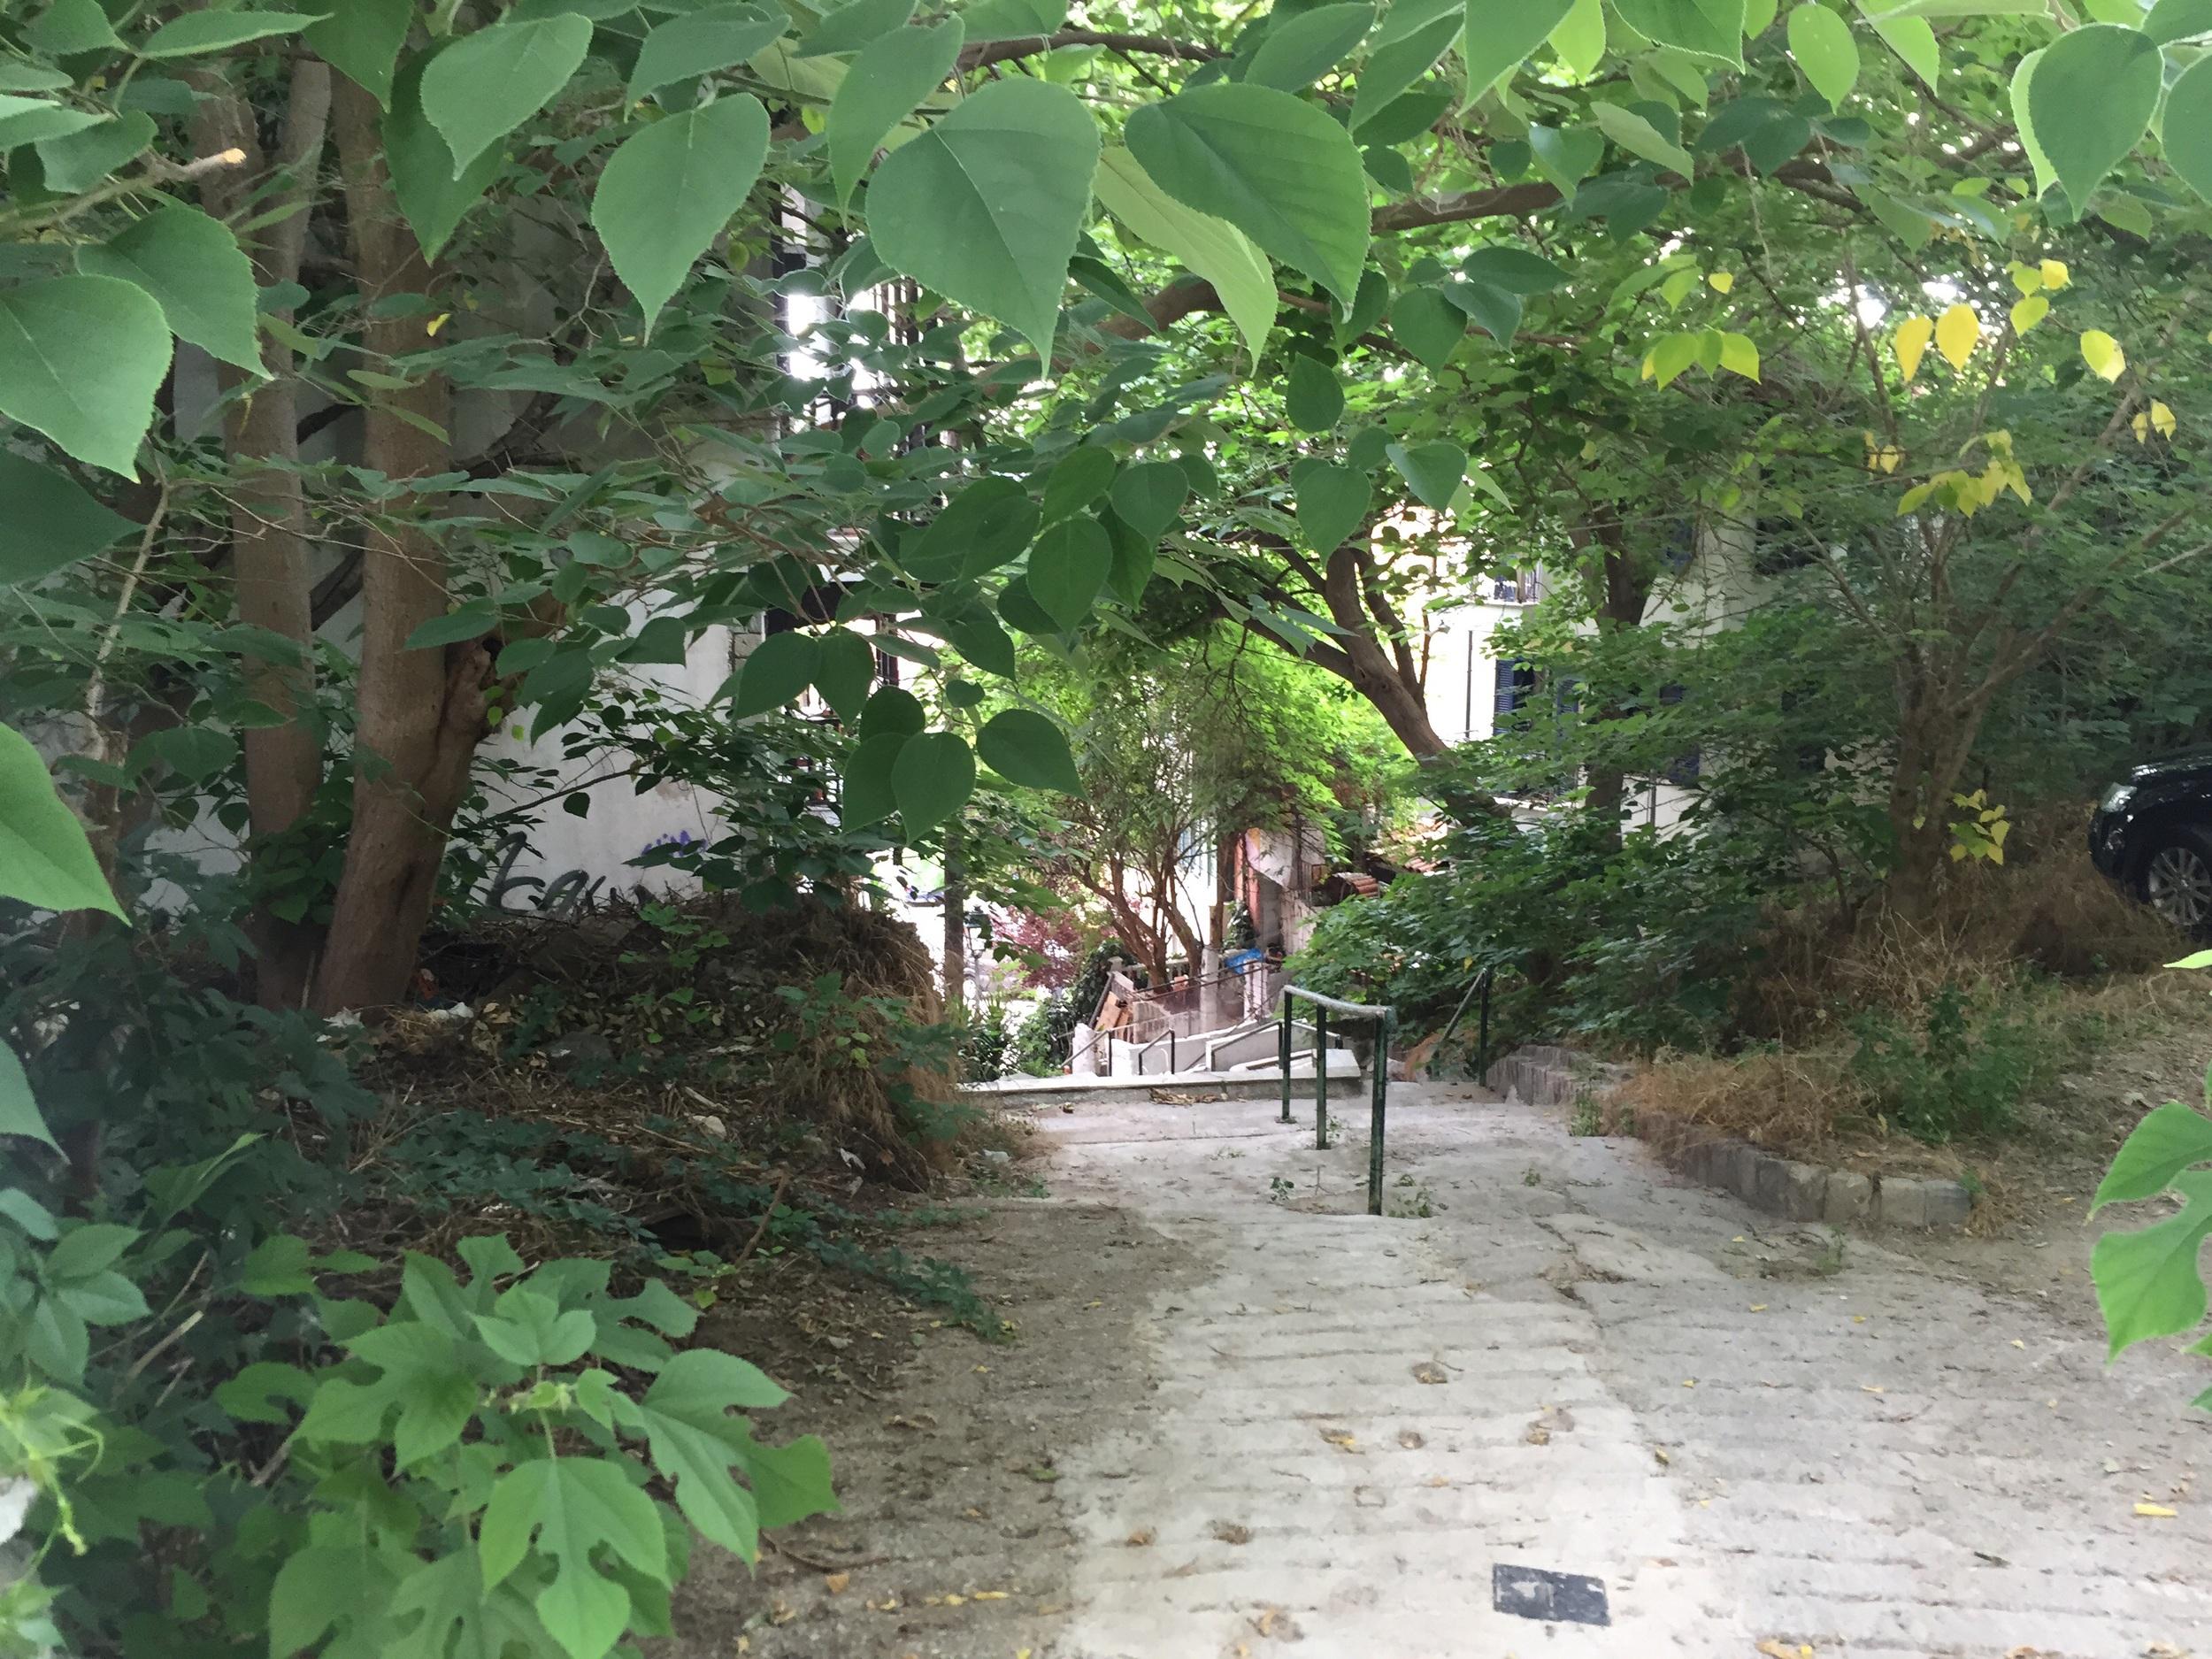 Quaint green labyrinth nearby